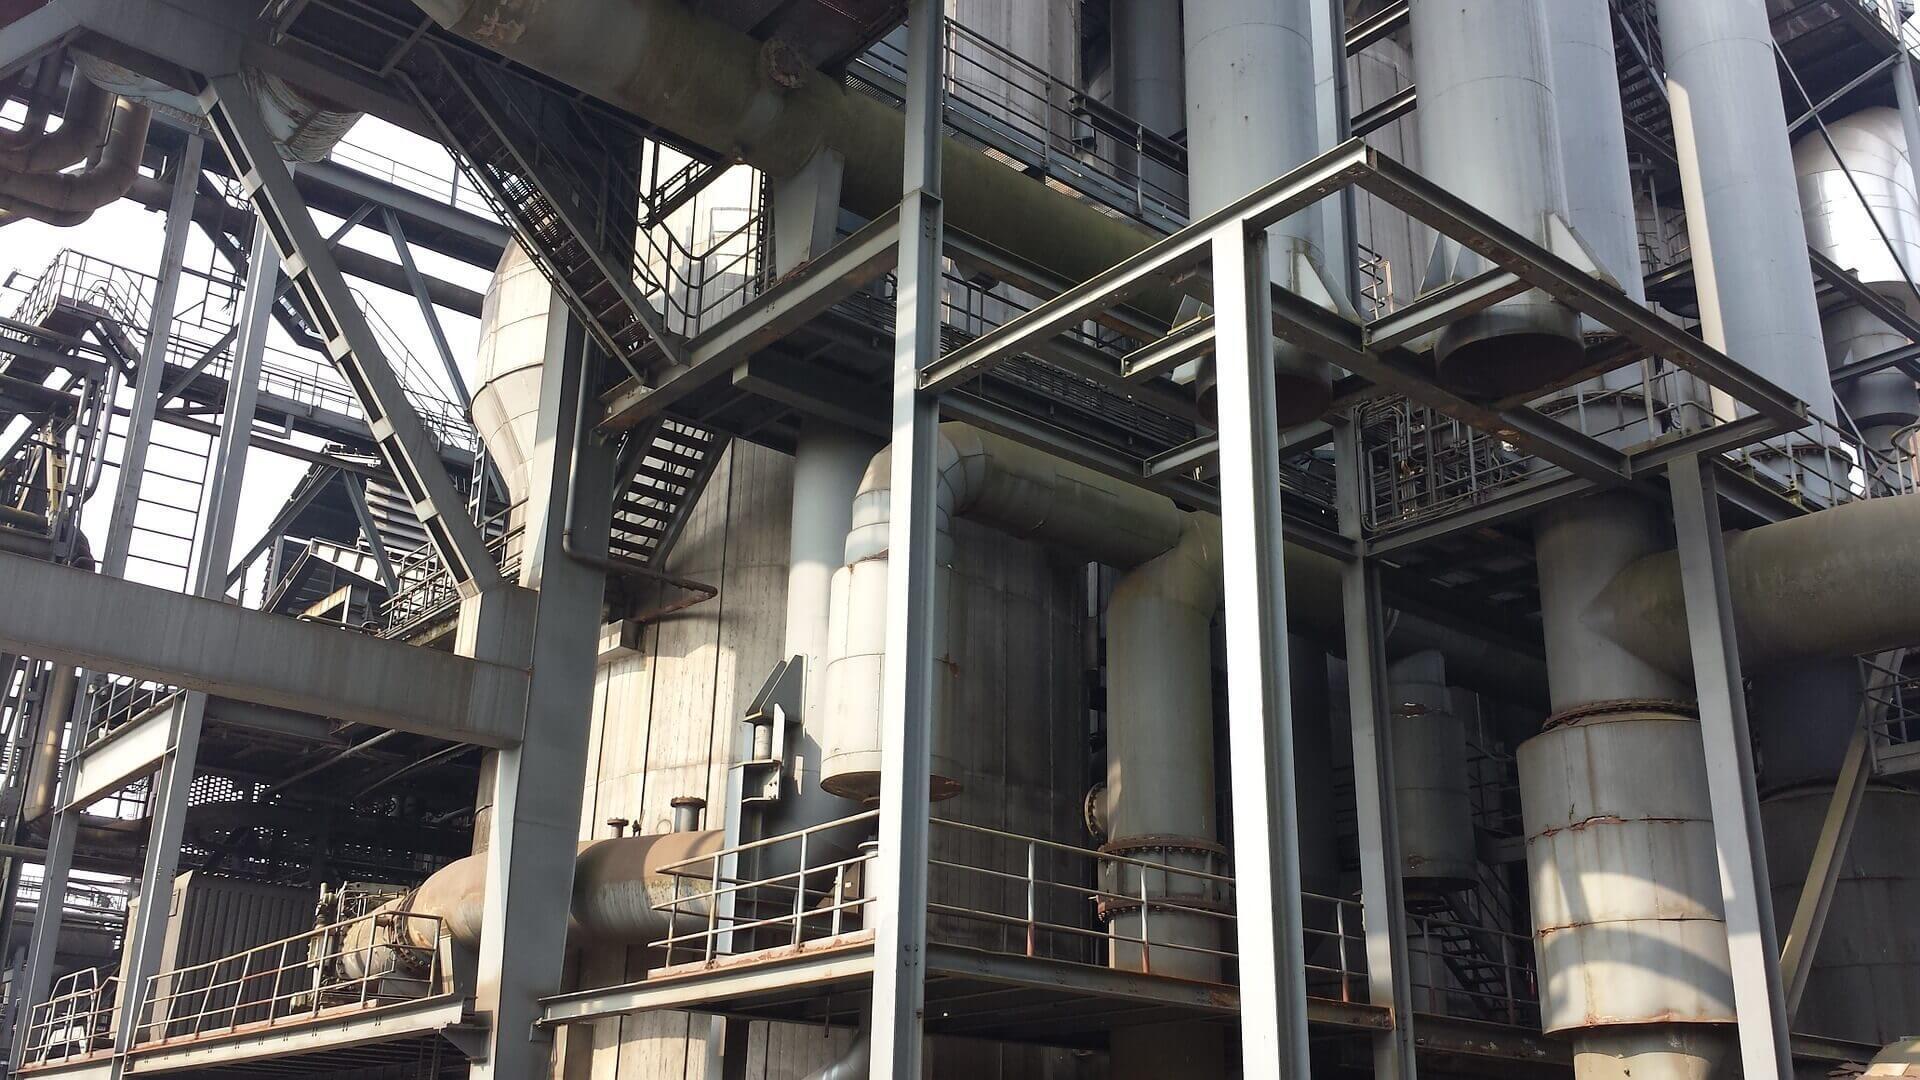 Arbeiten in der Industrie (c) marwed / pixabay.de